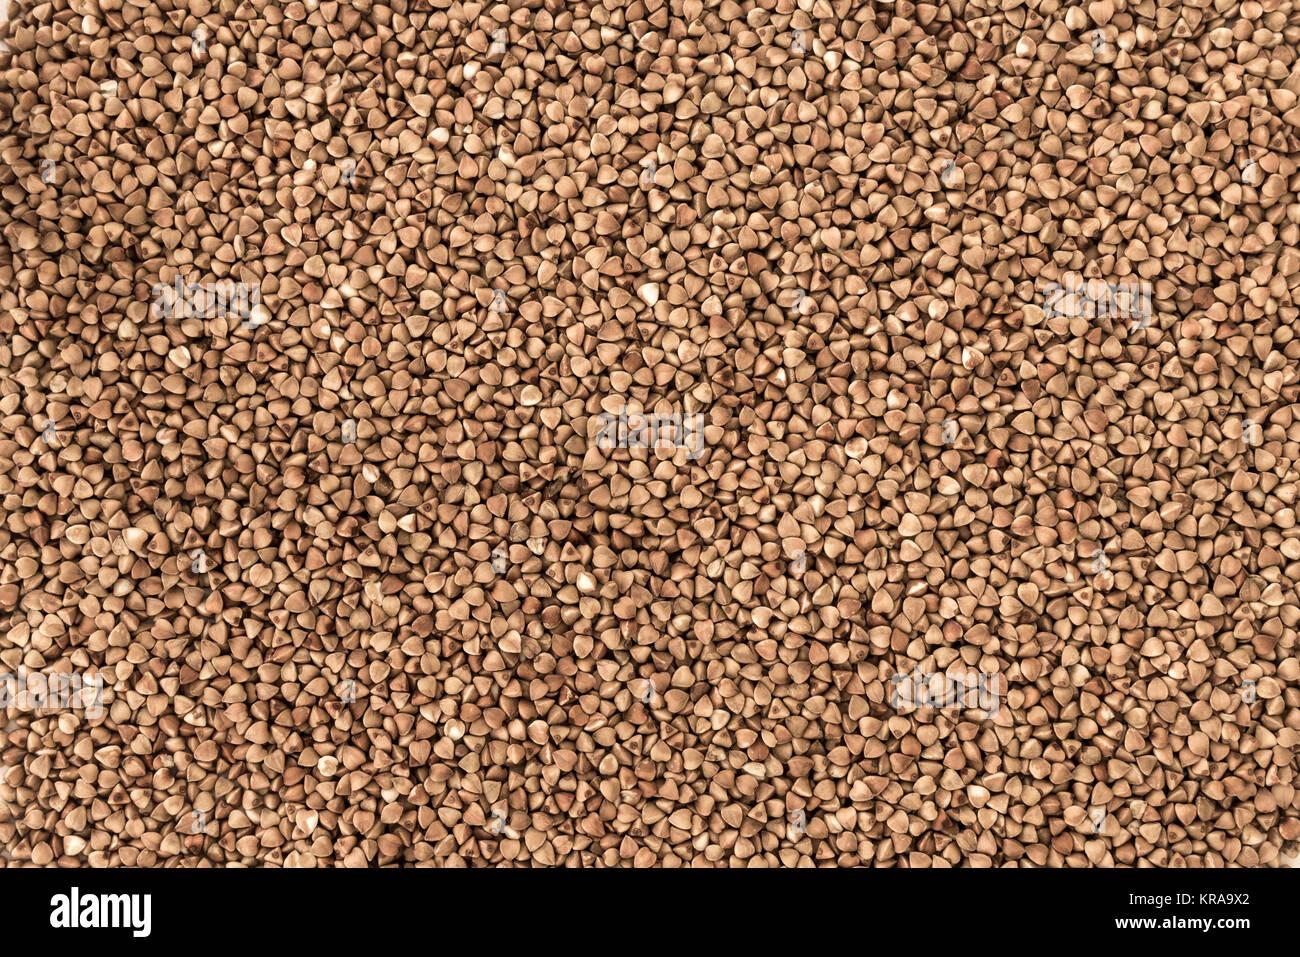 Dry Buckwheat Grain. Healthy Cereal Vegetarian Food Background - Stock Image